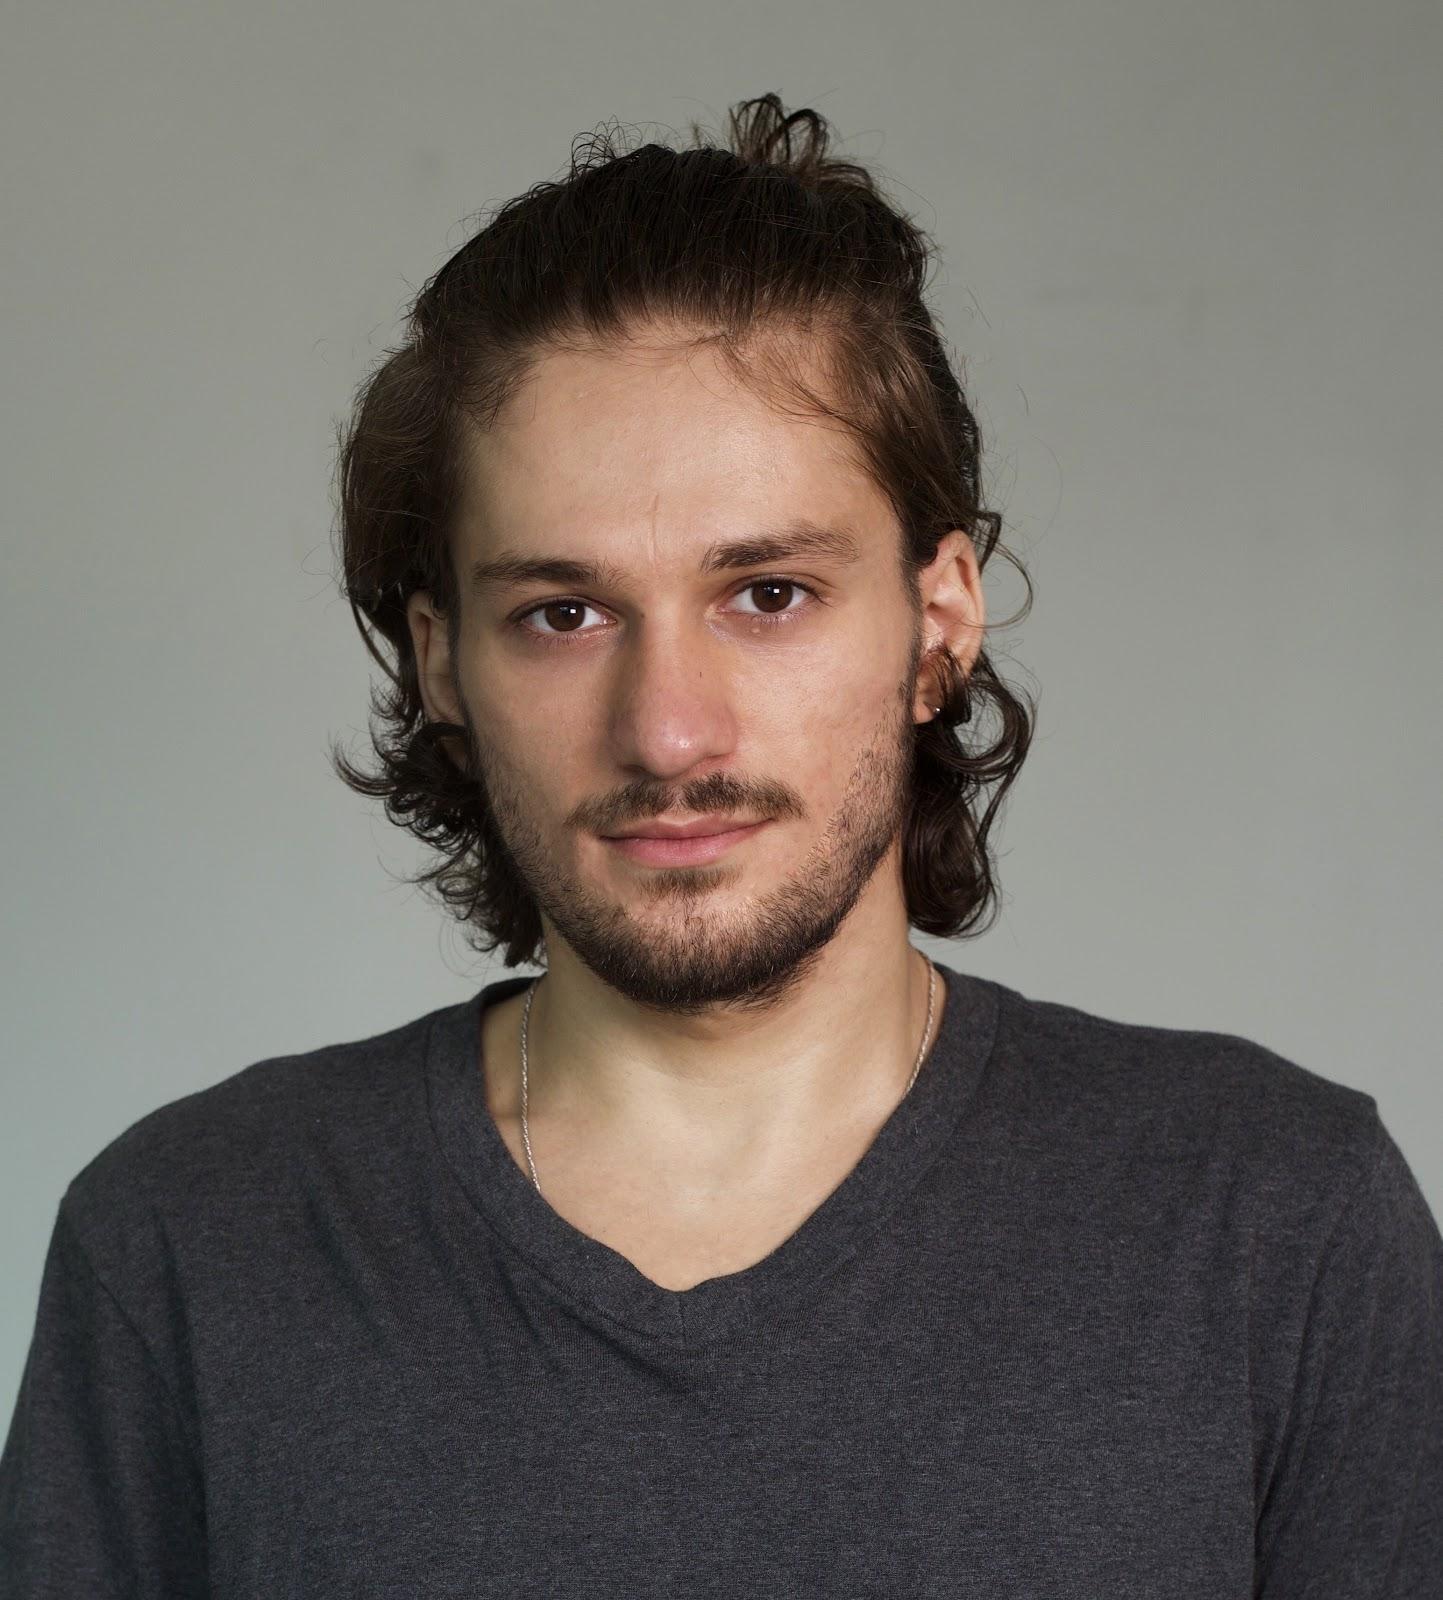 Mark Polskii